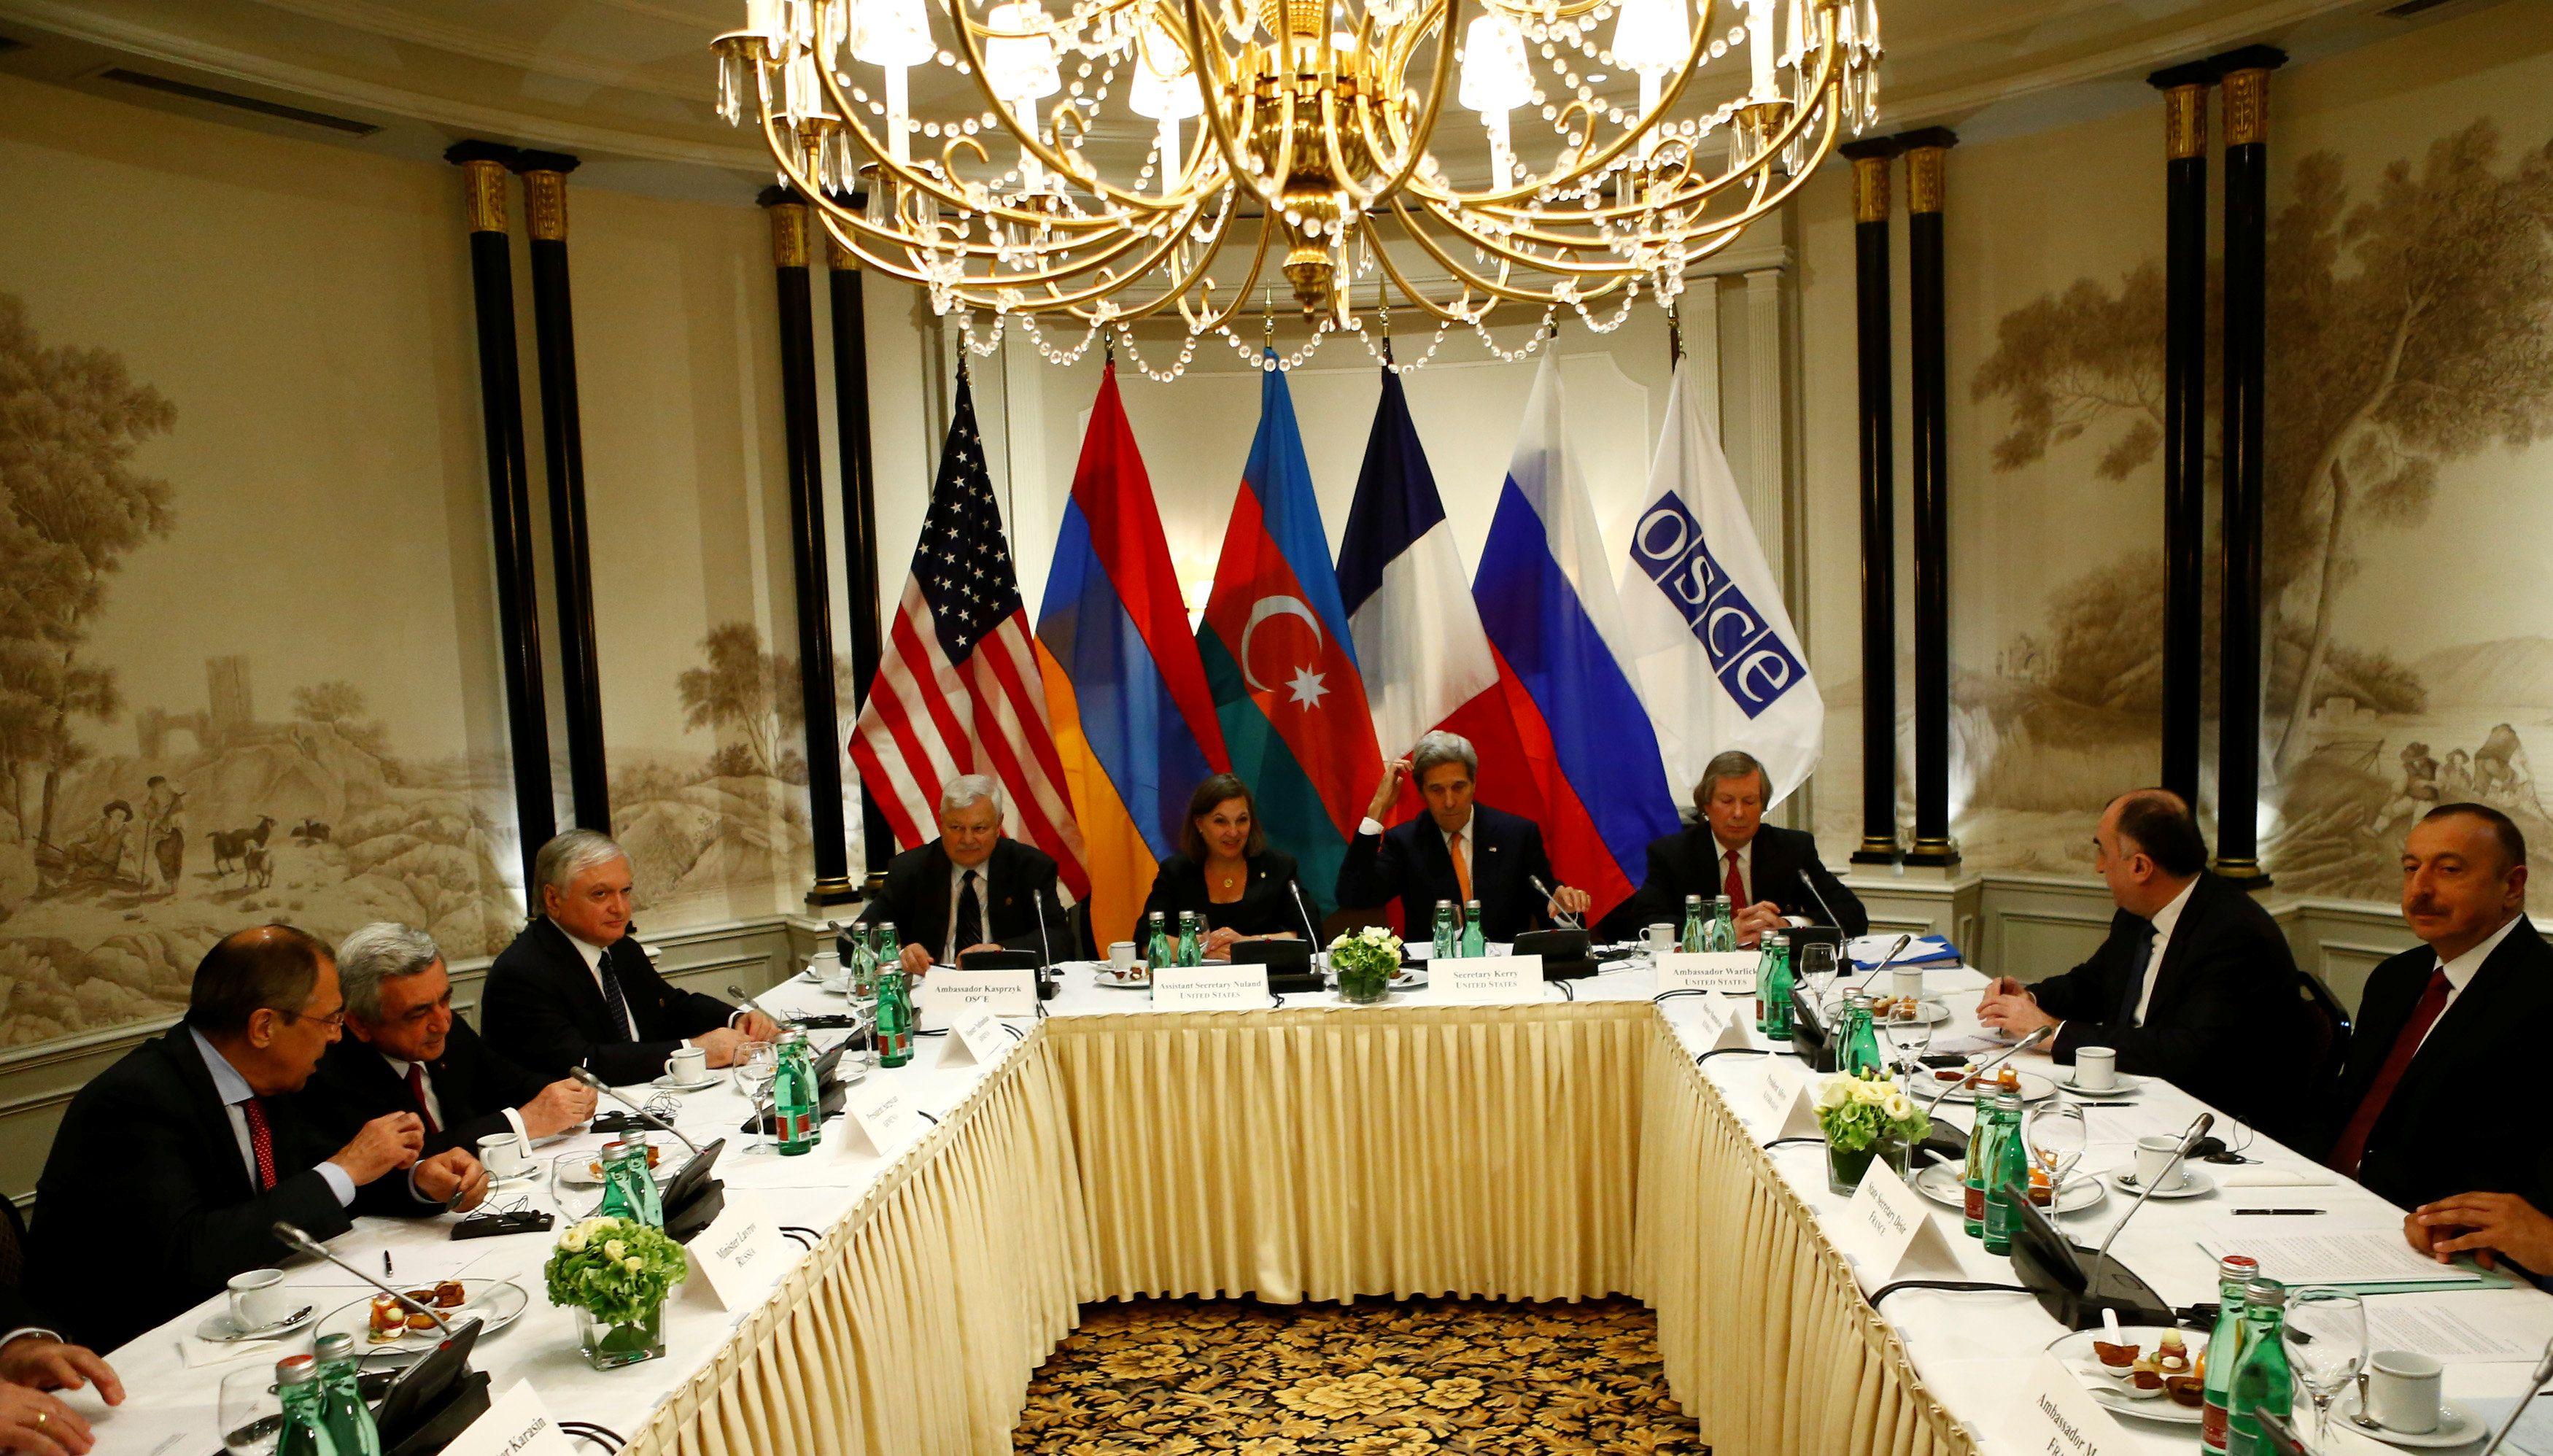 Встреча президентов Армении и Азербайджана.